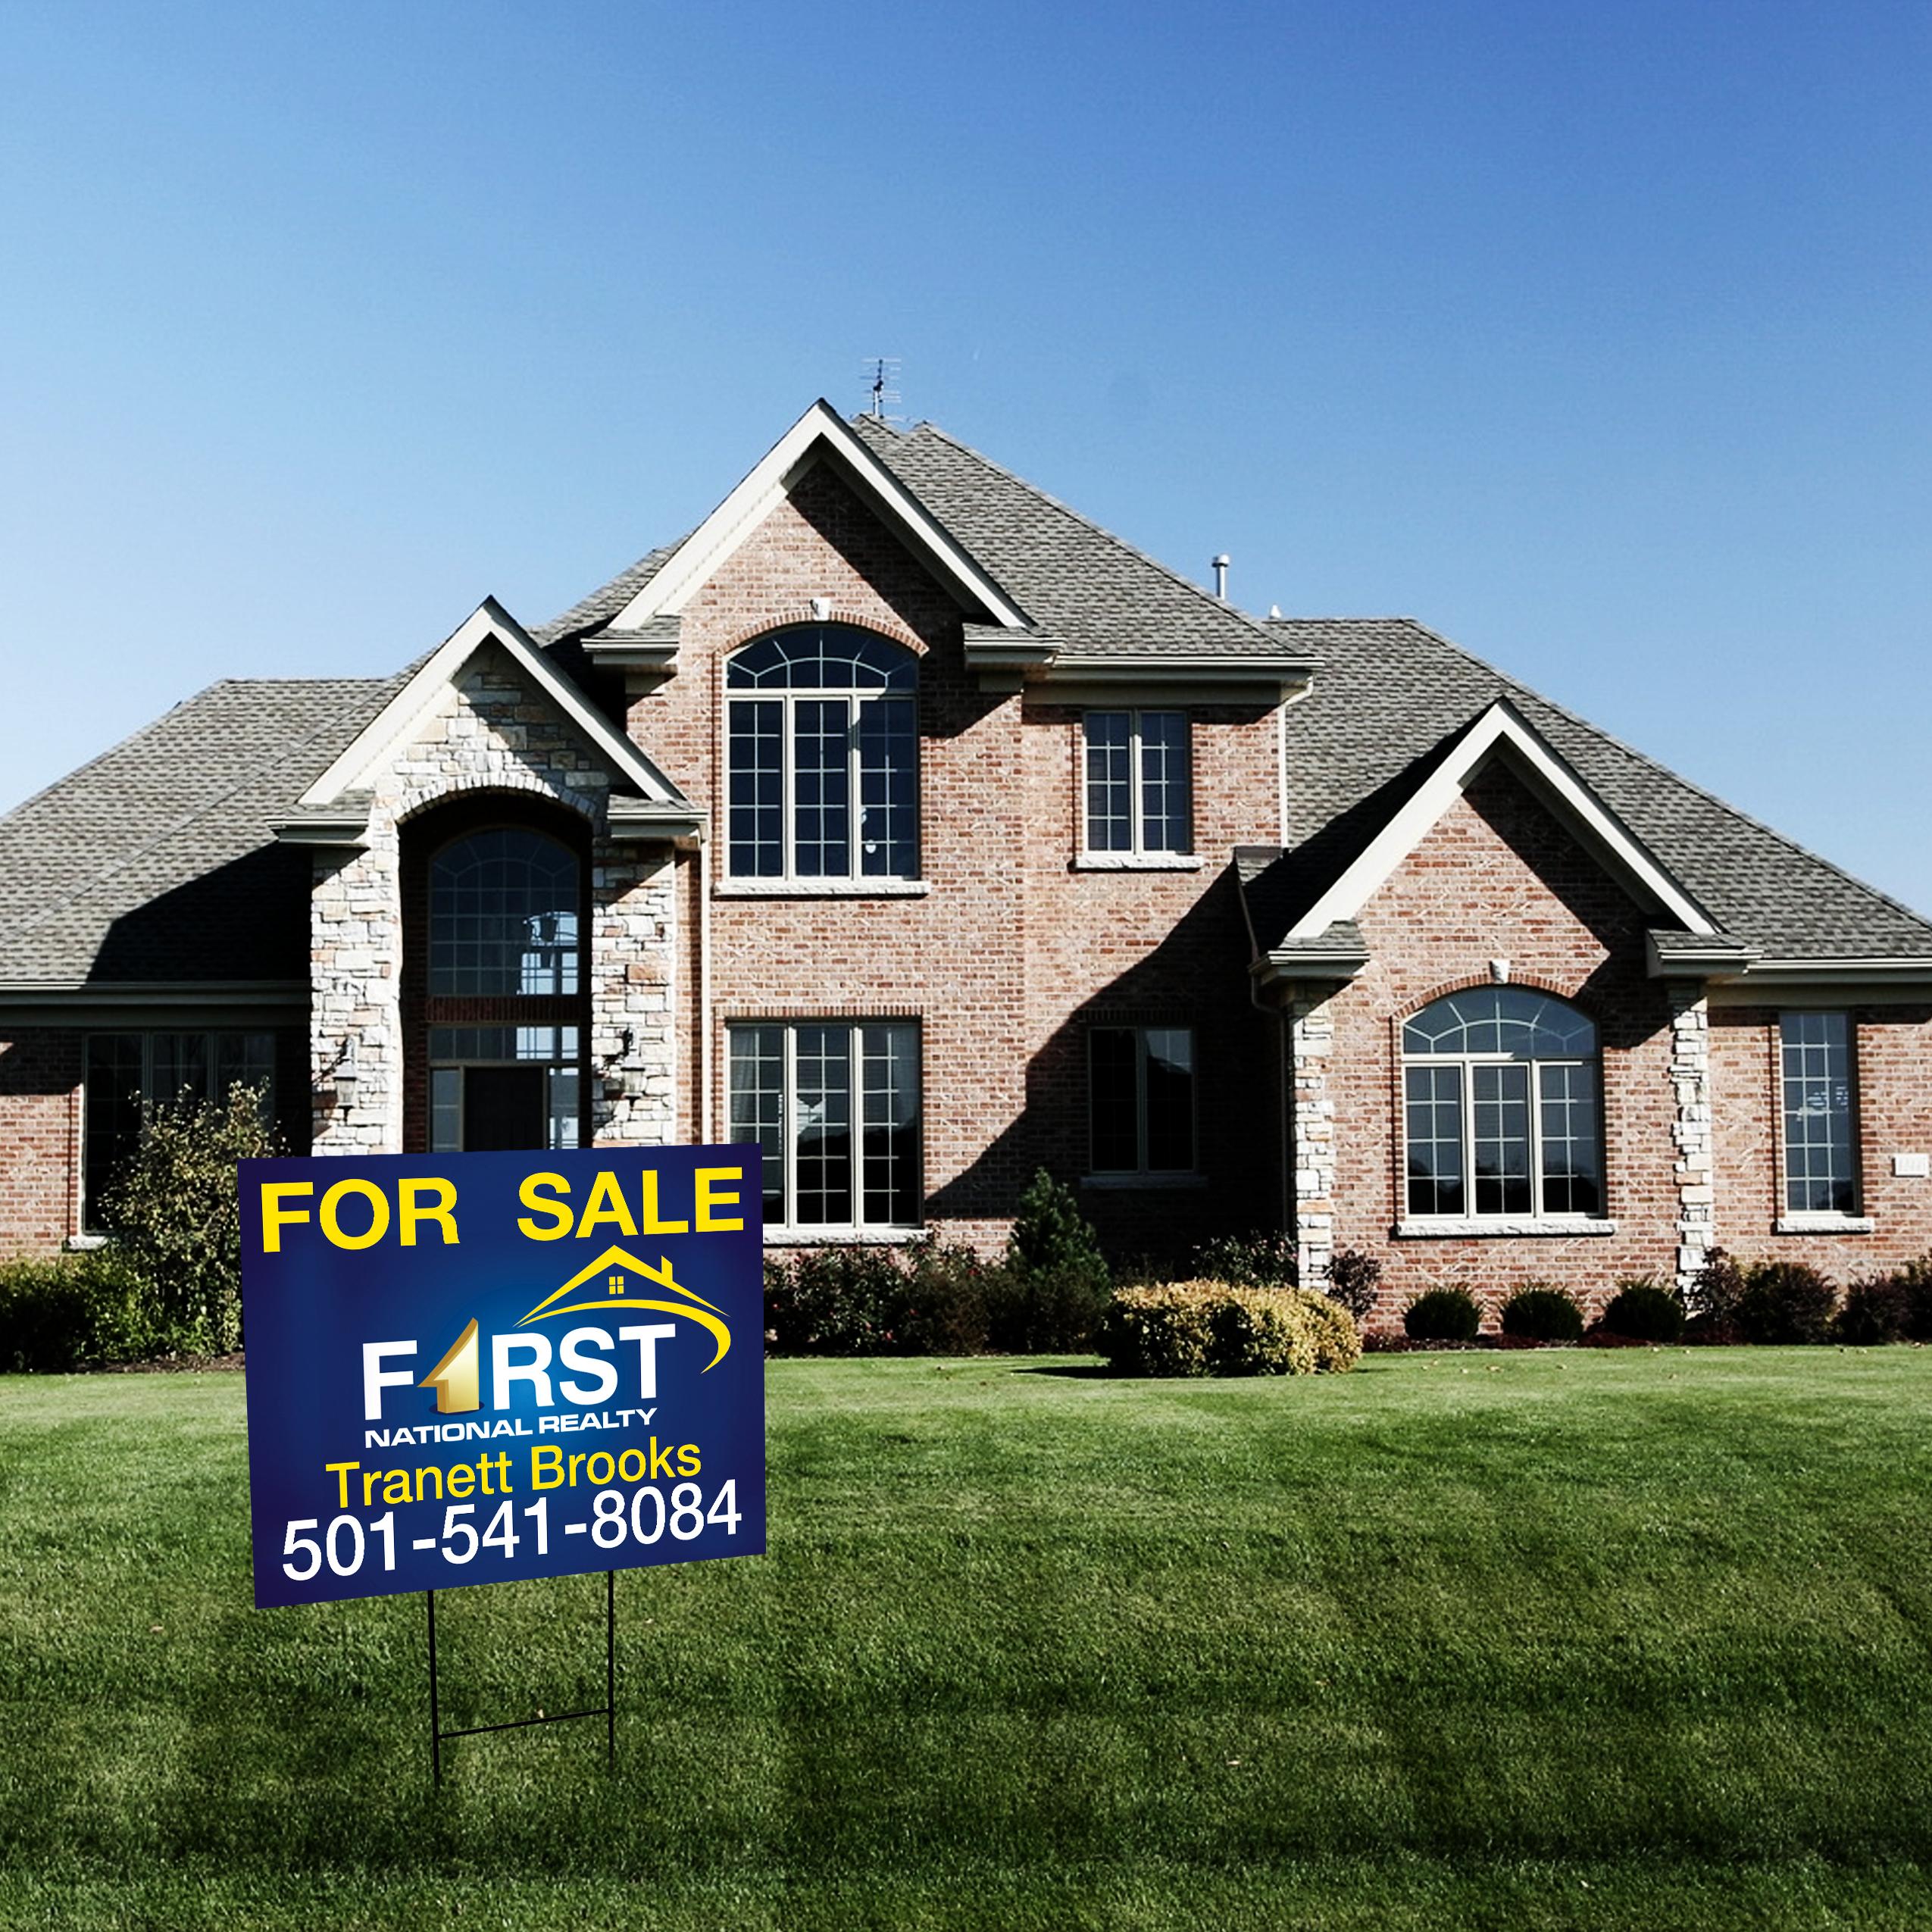 Real Estate Sign Design Emh Graphics